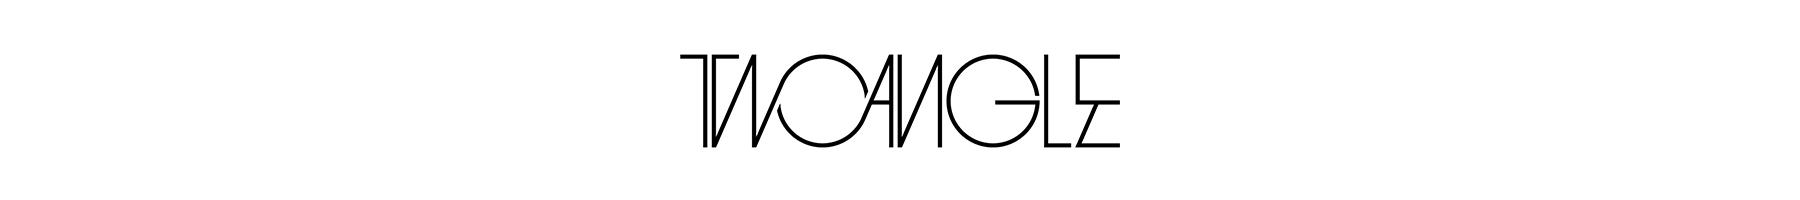 DrJays.com - TwoAngle